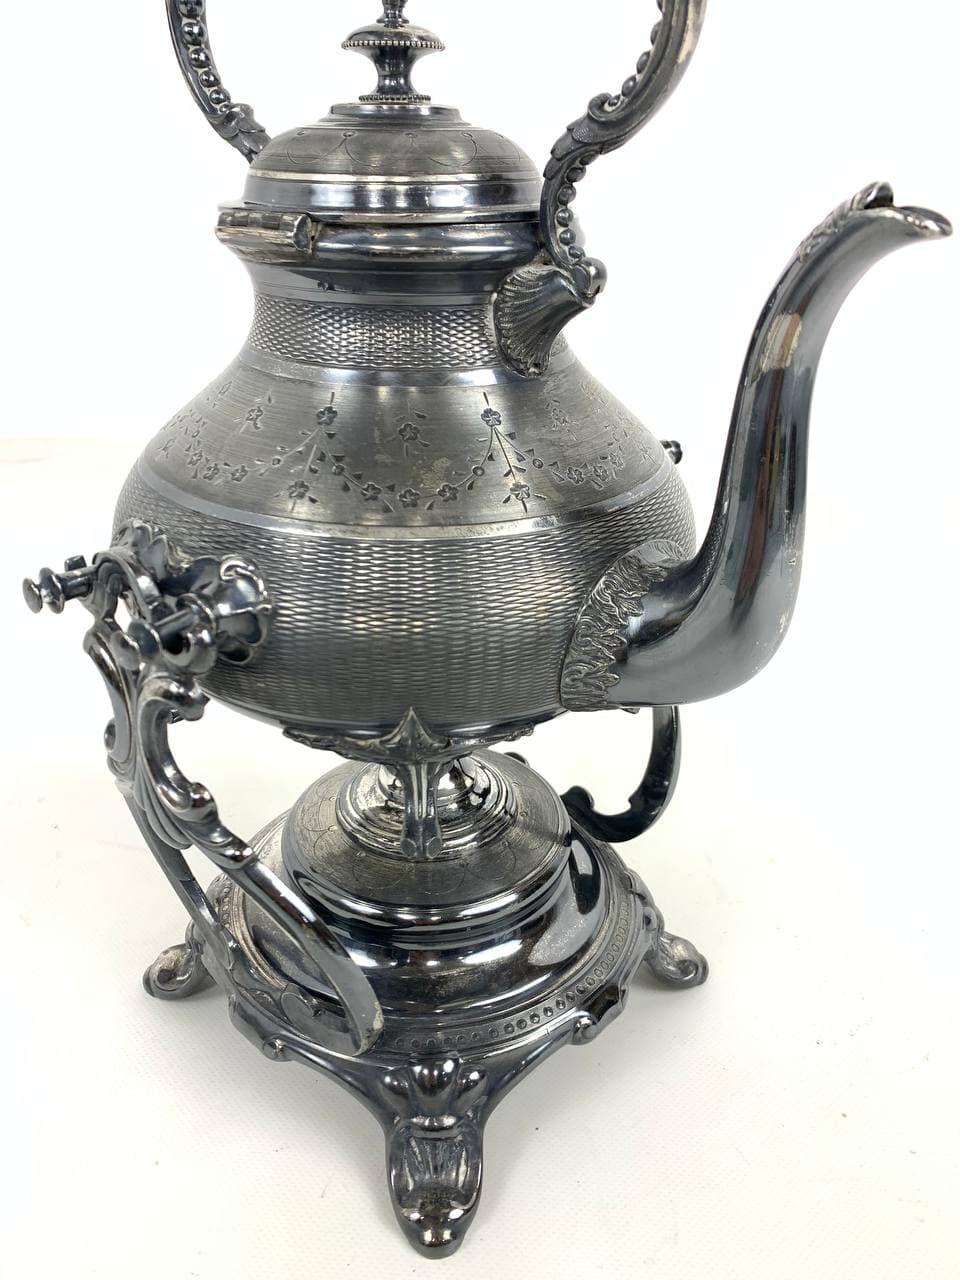 Антикварный чайник эпохи Наполеона III